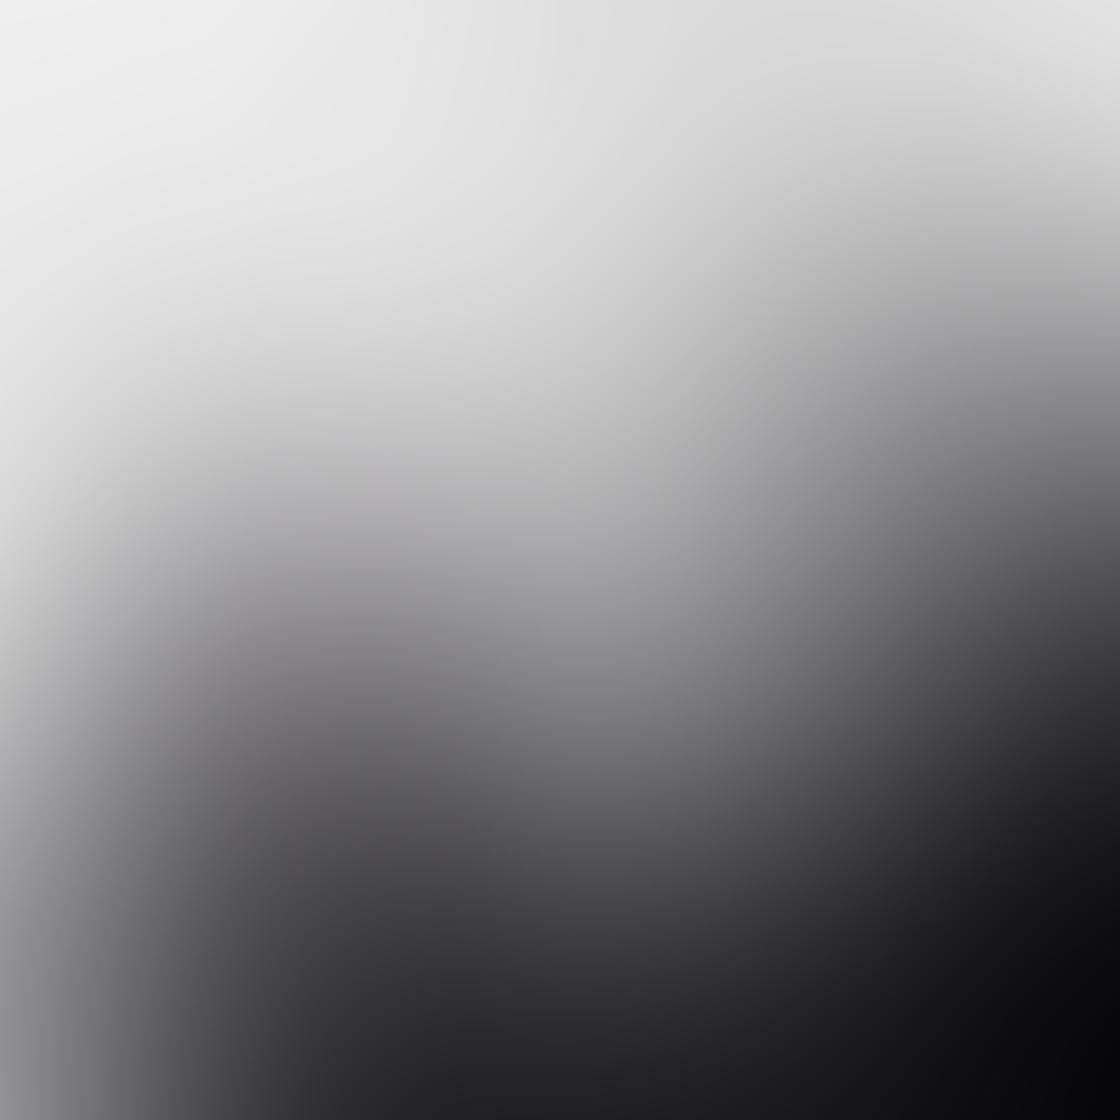 iPhone Photo Shadows 28